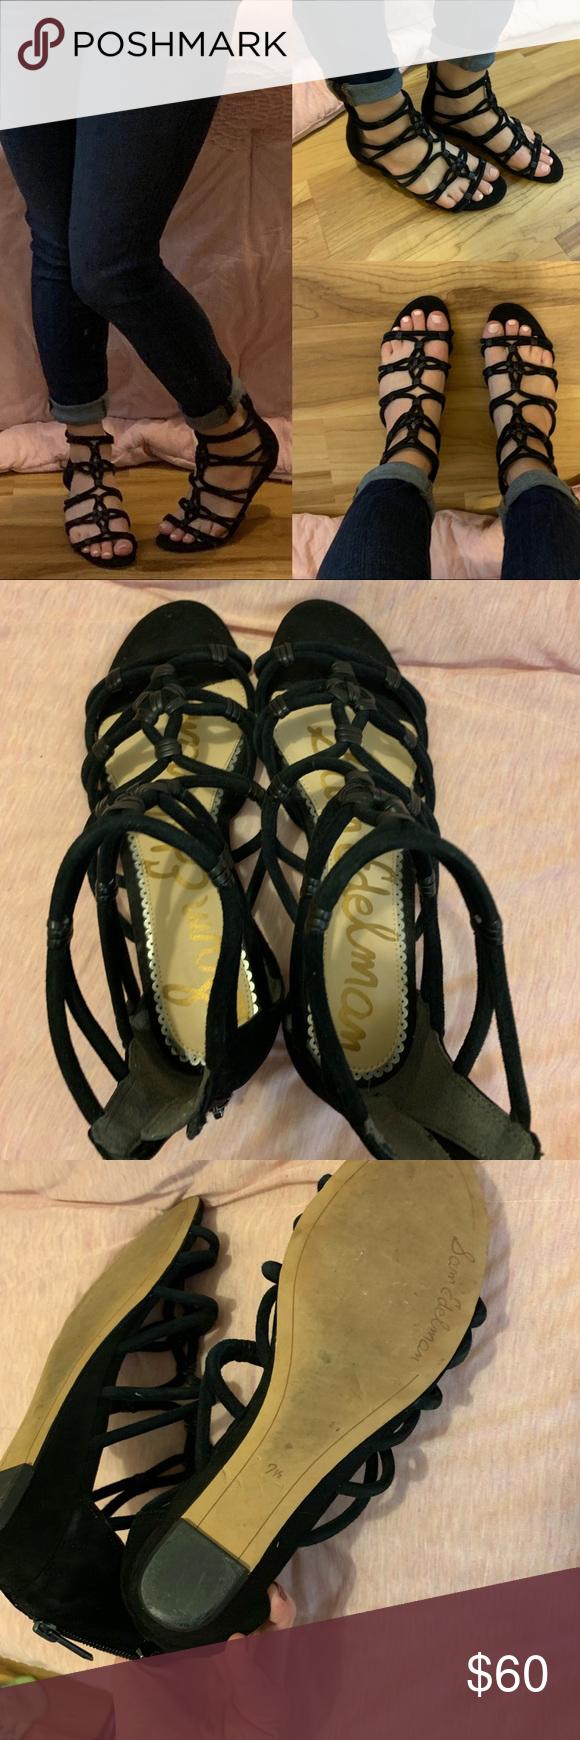 c3da82d377d Same Edelman Daryn gladiator sandal 7.5 leather Same Edelman Daryn  gladiator sandal 7.5 leather worn a